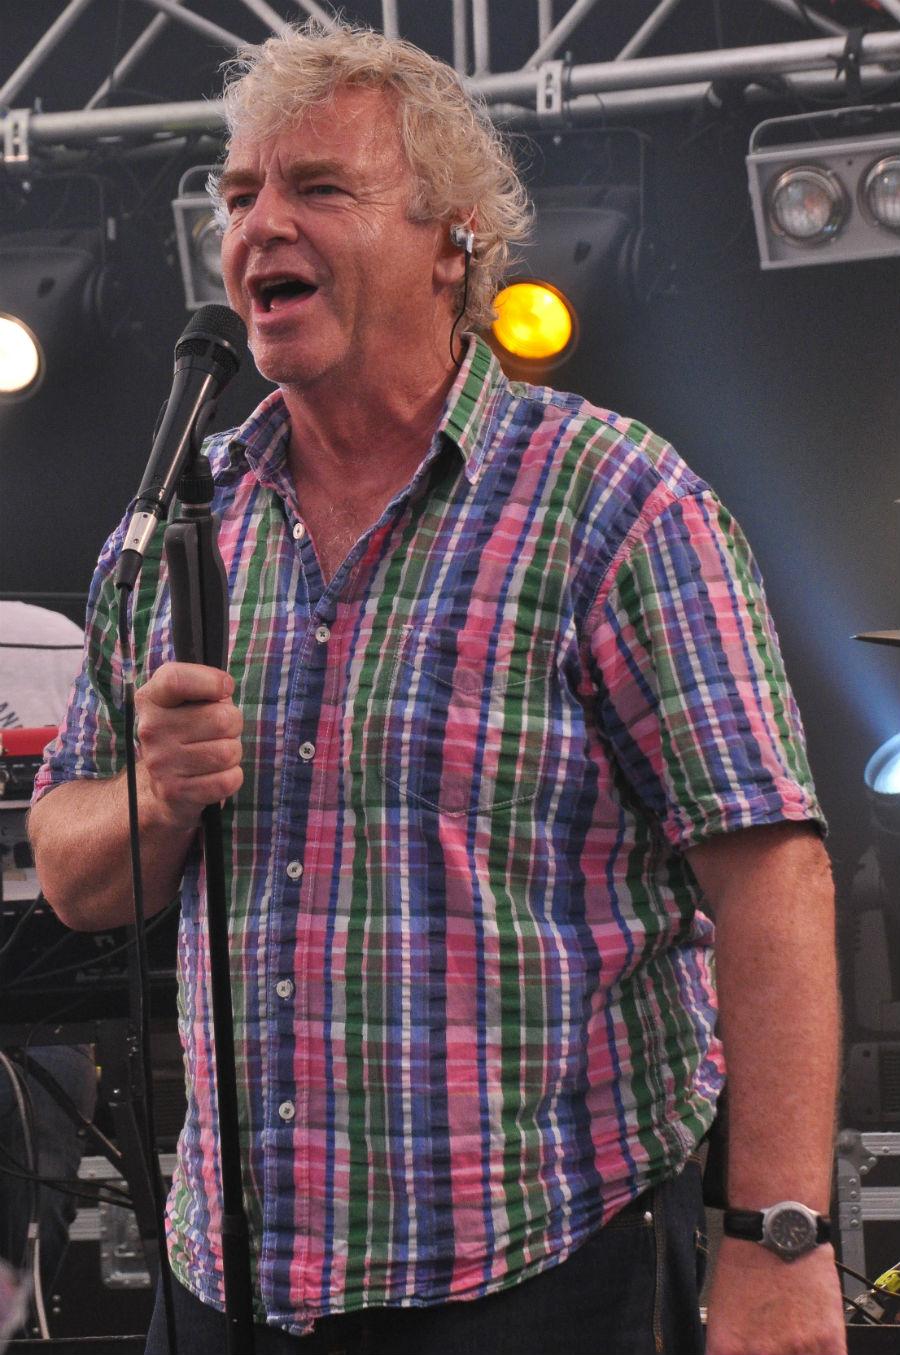 Michael Bundesen